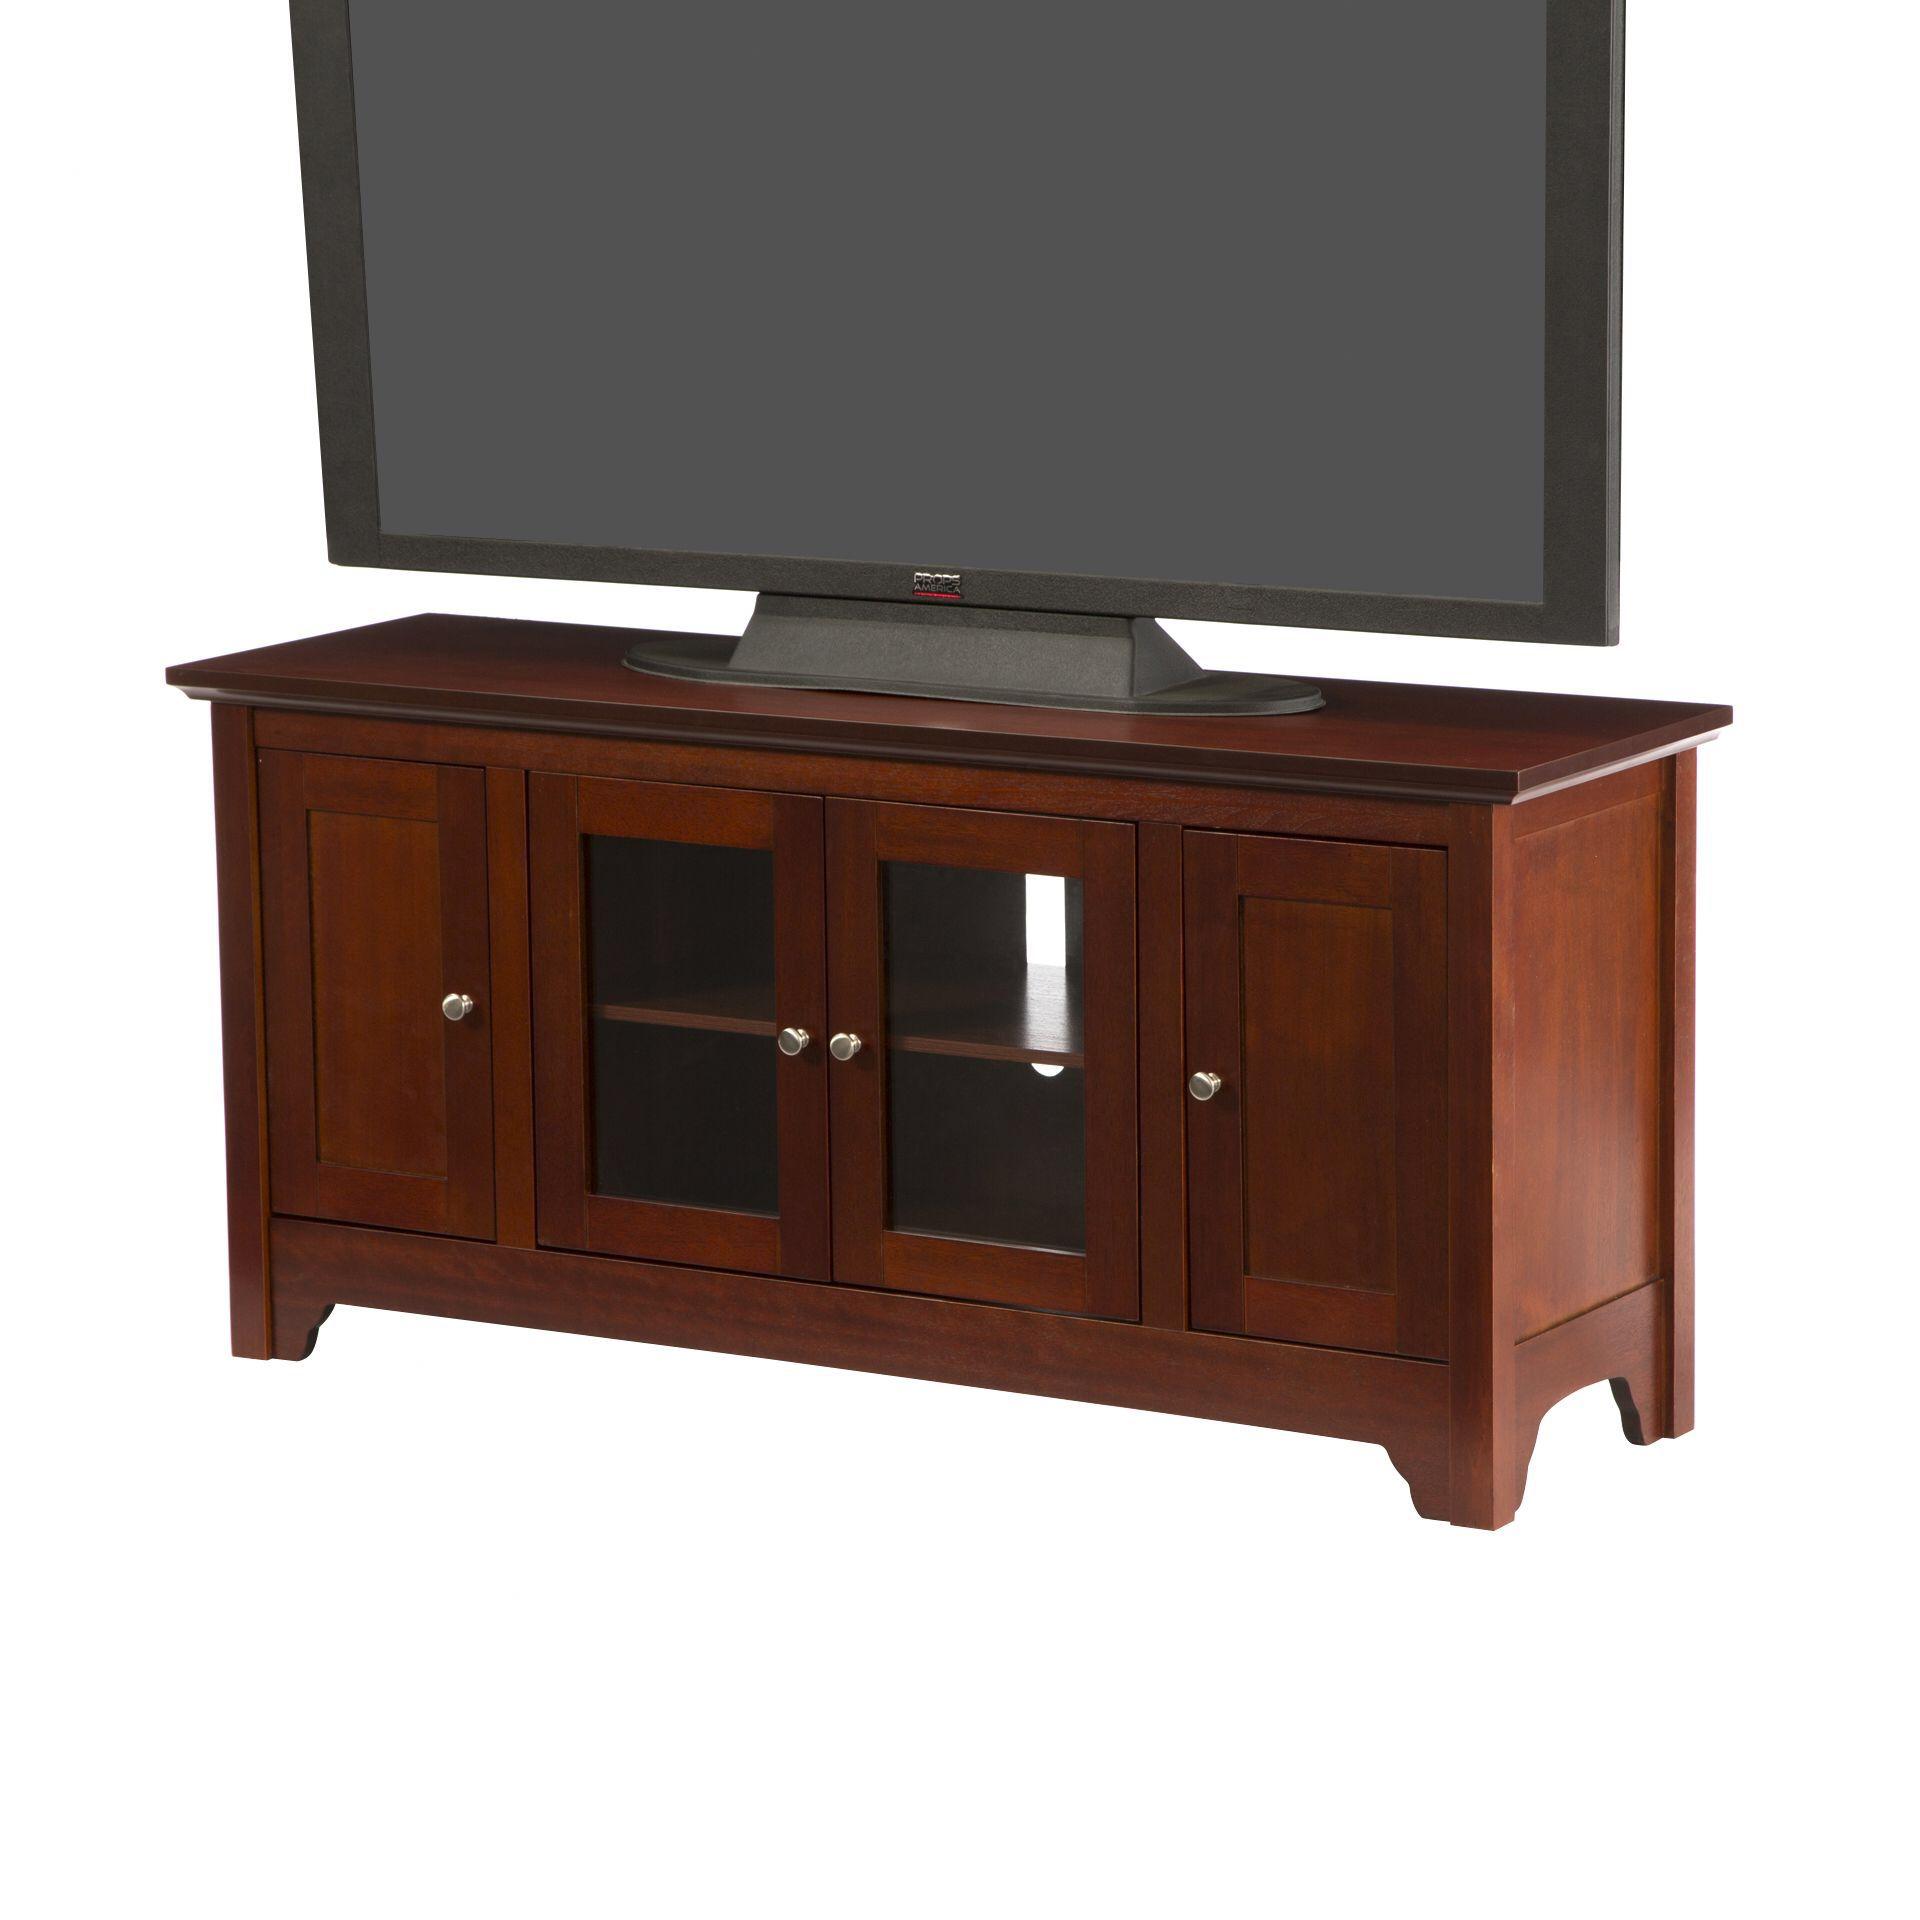 "Klaus 52"" TV Stand"